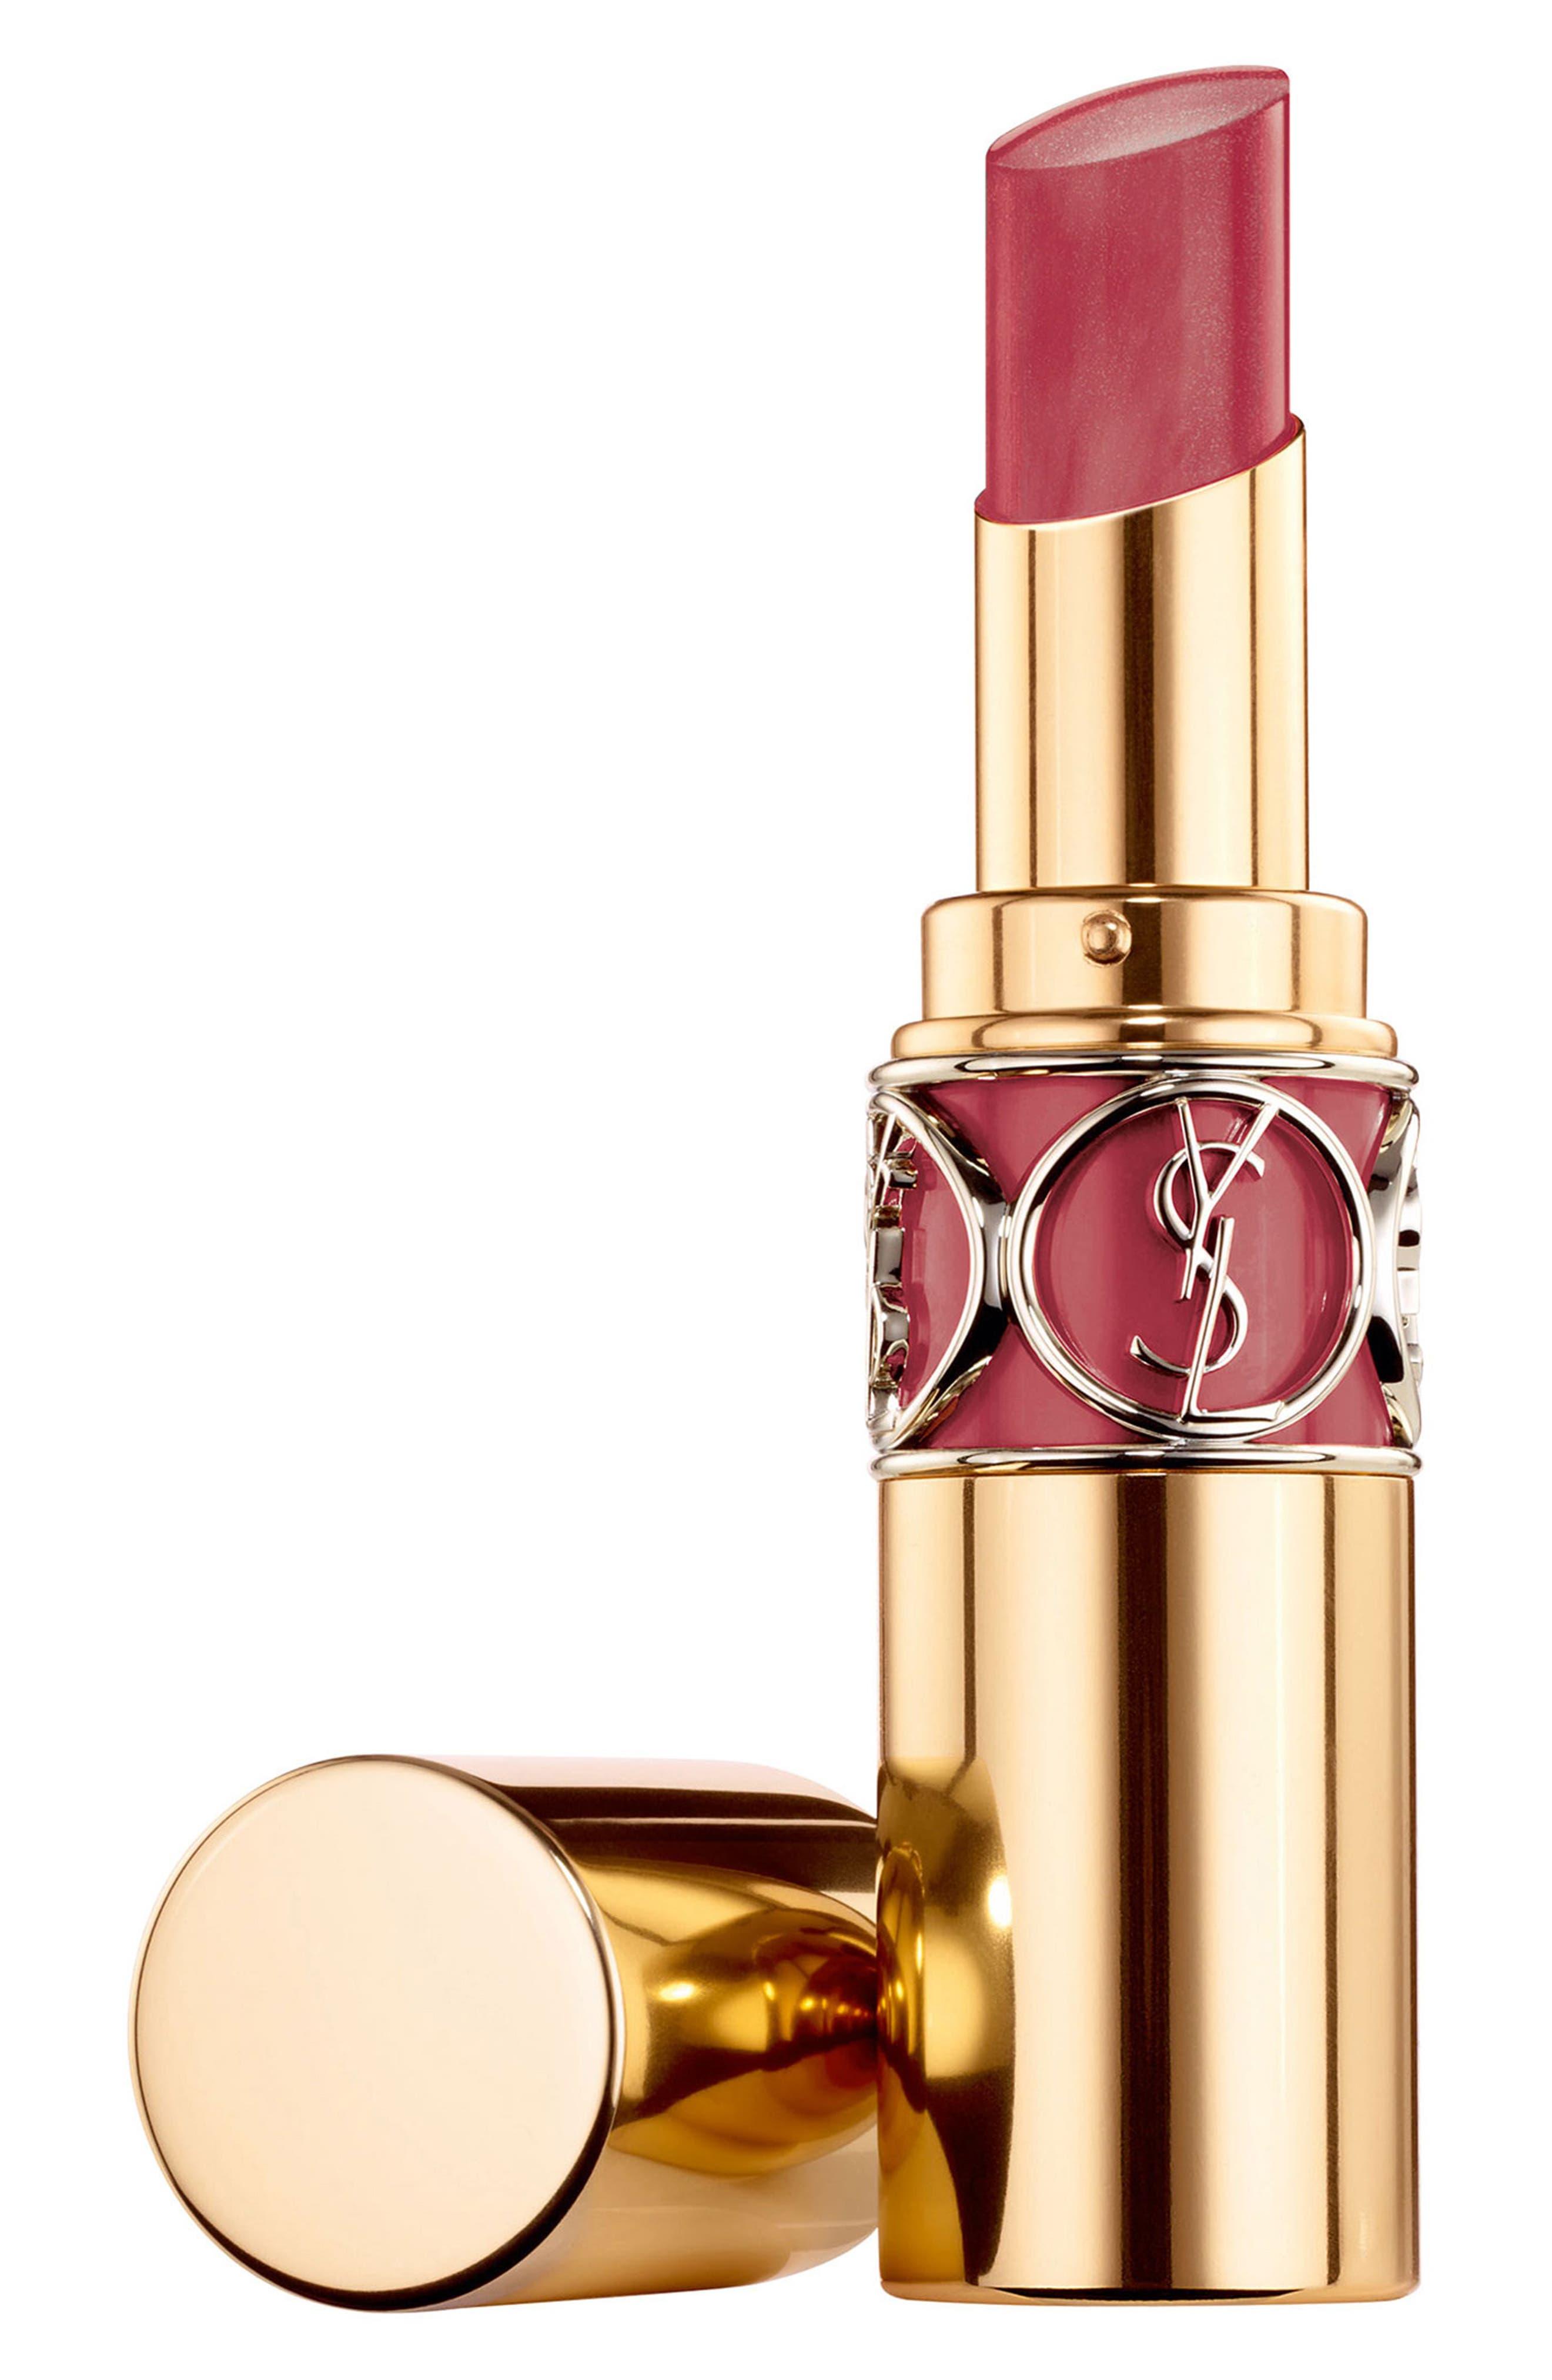 Yves Saint Laurent Rouge Volupte Shine Oil-In-Stick Lipstick - Rose Afrique